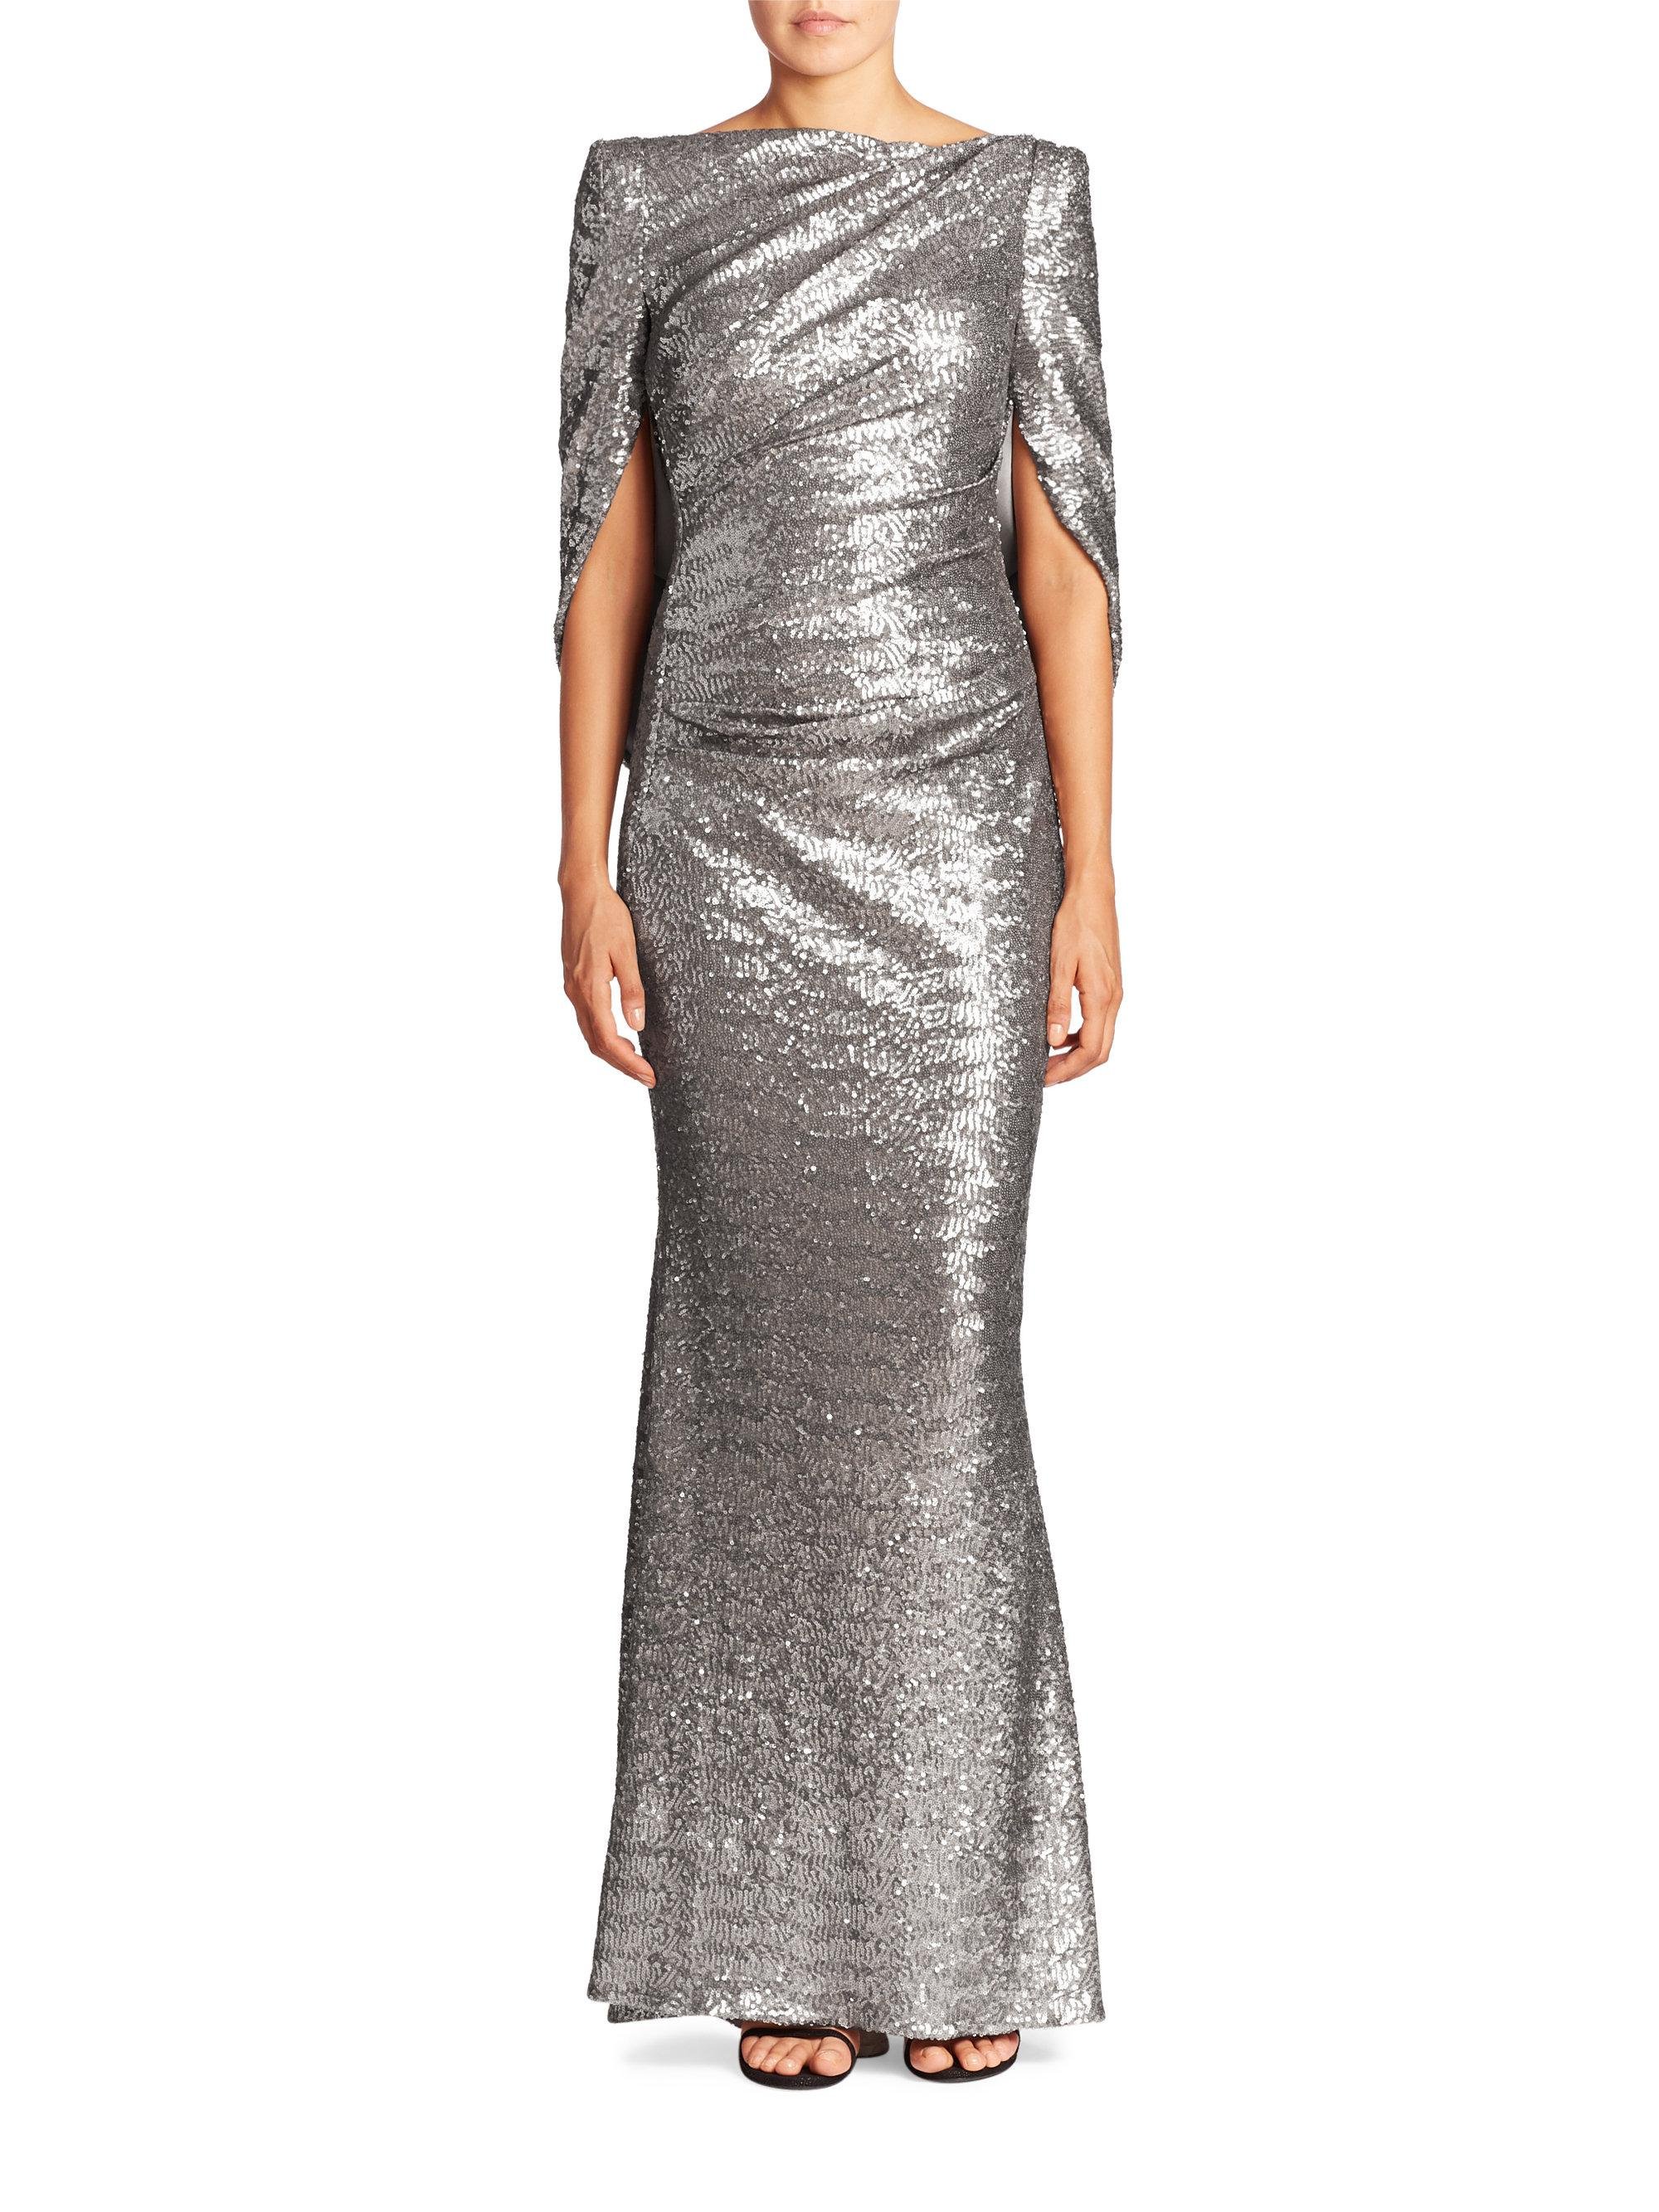 Lyst - Talbot Runhof Sequin Cape Gown in Metallic